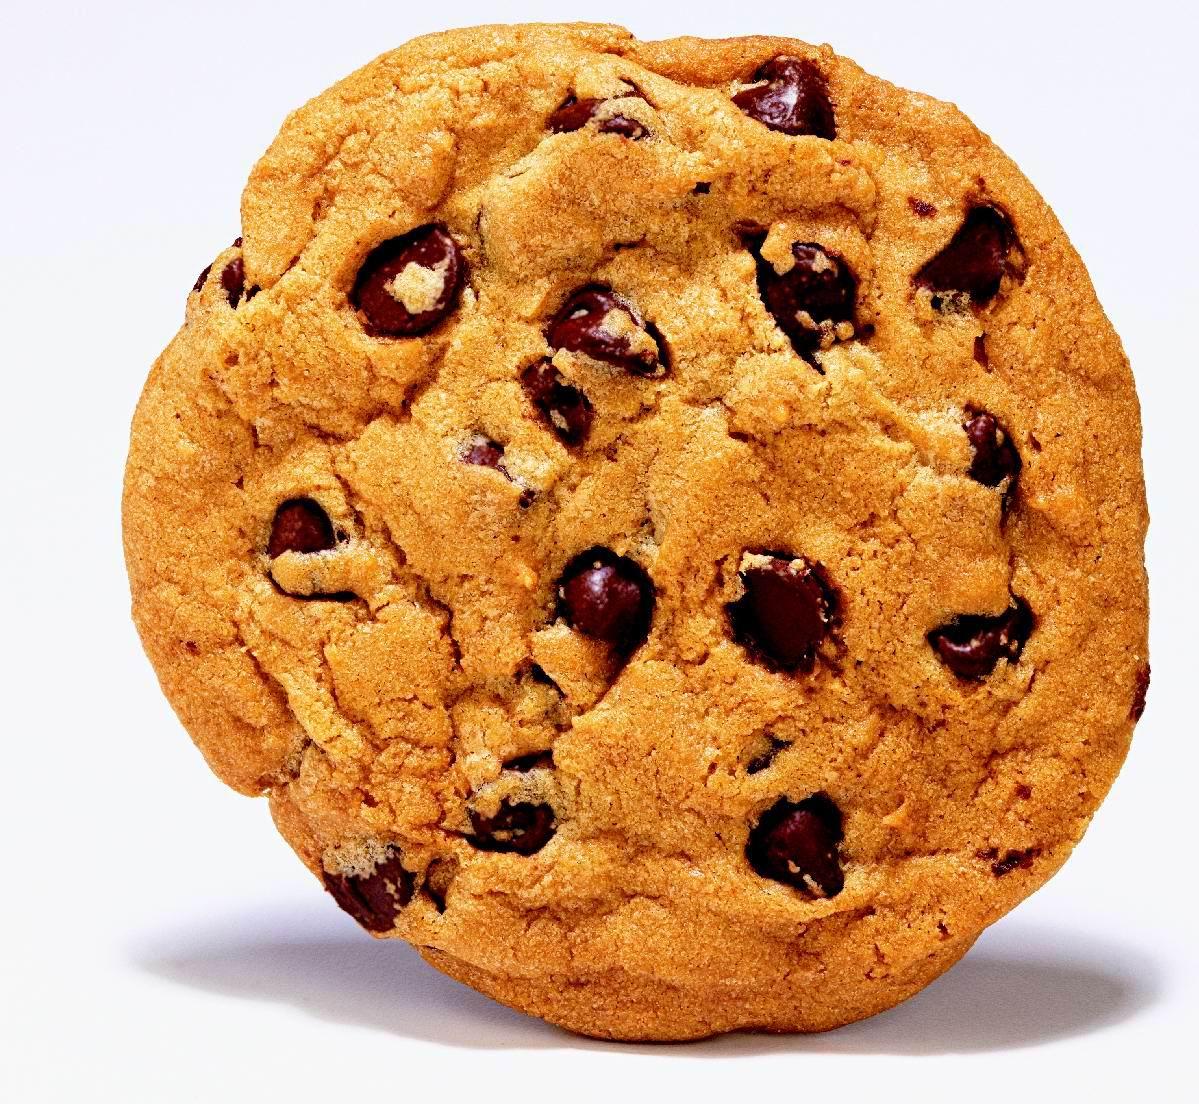 Image - Chocolate chip cookie.jpg | Recipes Wiki | Fandom powered ...